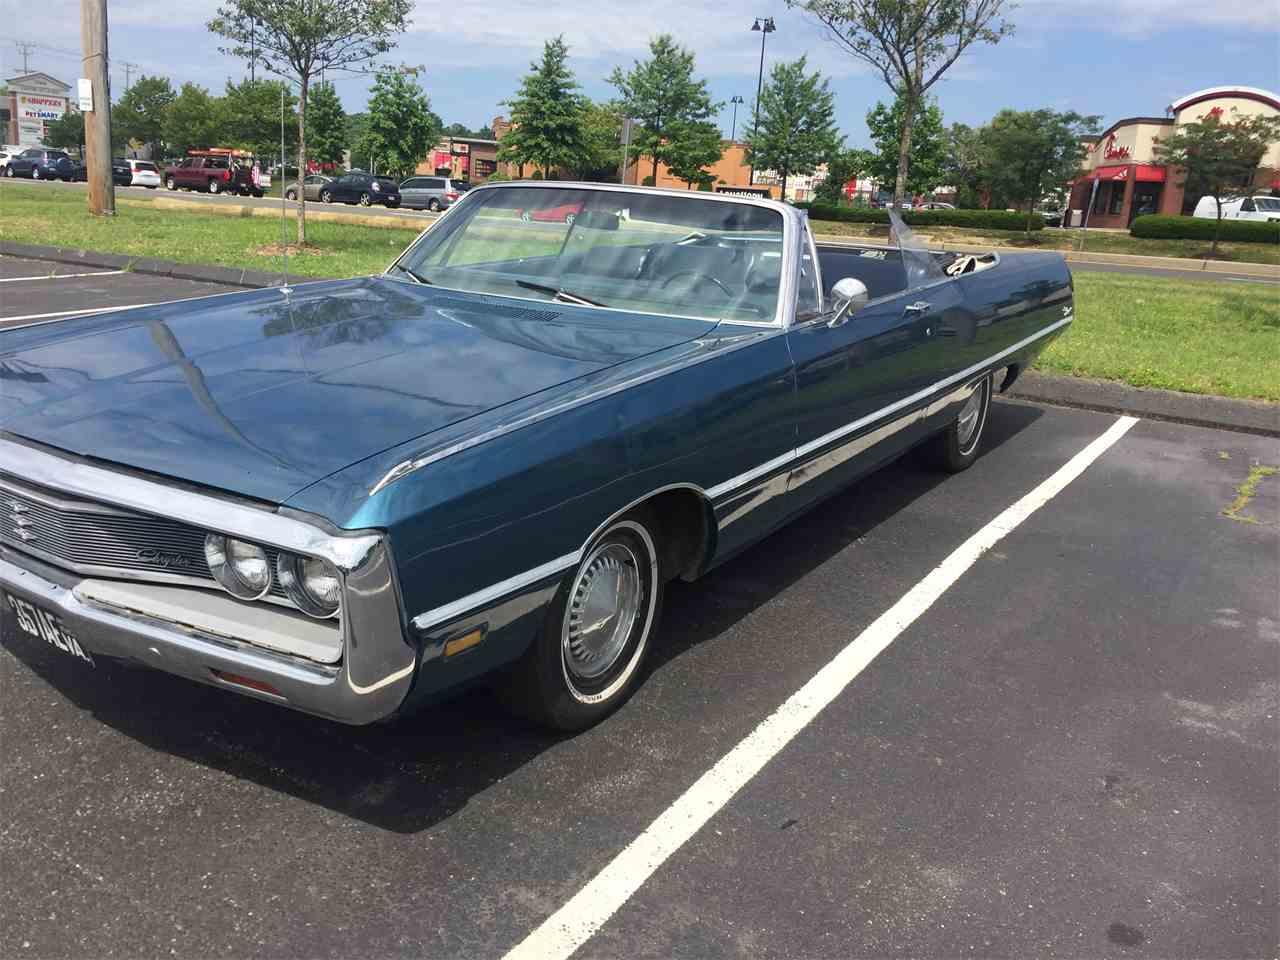 1969 Chrysler Newport for Sale | ClassicCars.com | CC-985504